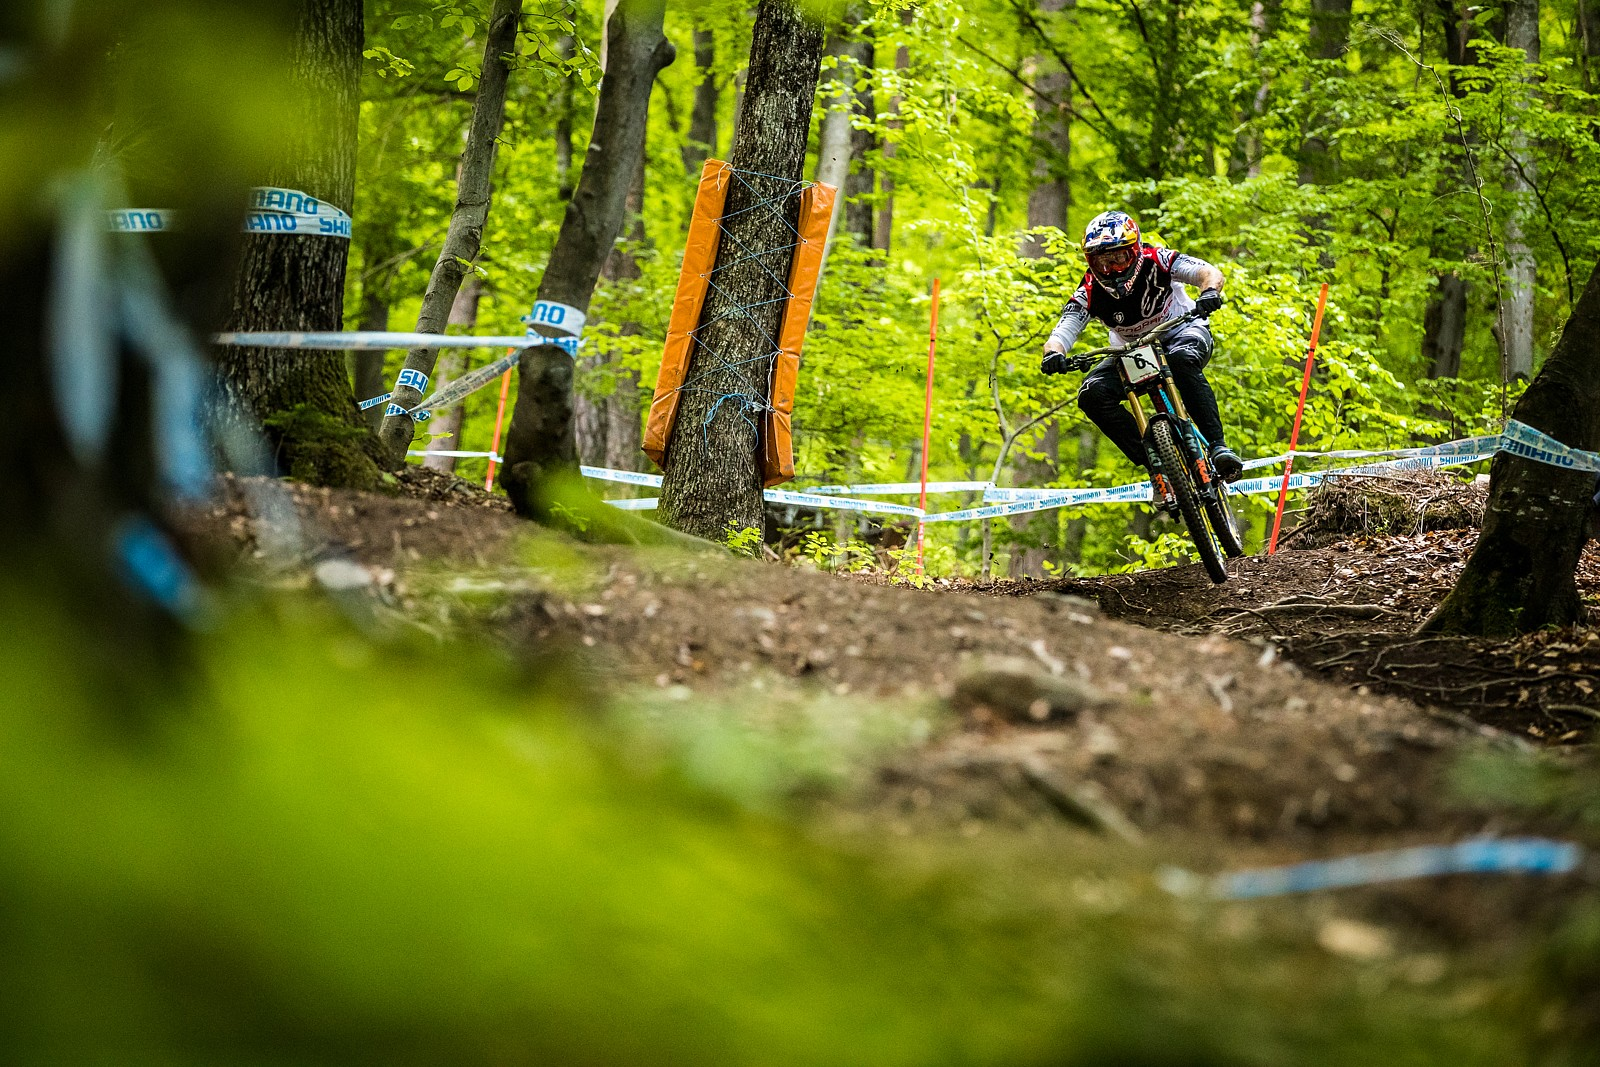 Brook Macdonald in Maribor - A Big Bad Batch of Brook Macdonald Bangers - Mountain Biking Pictures - Vital MTB